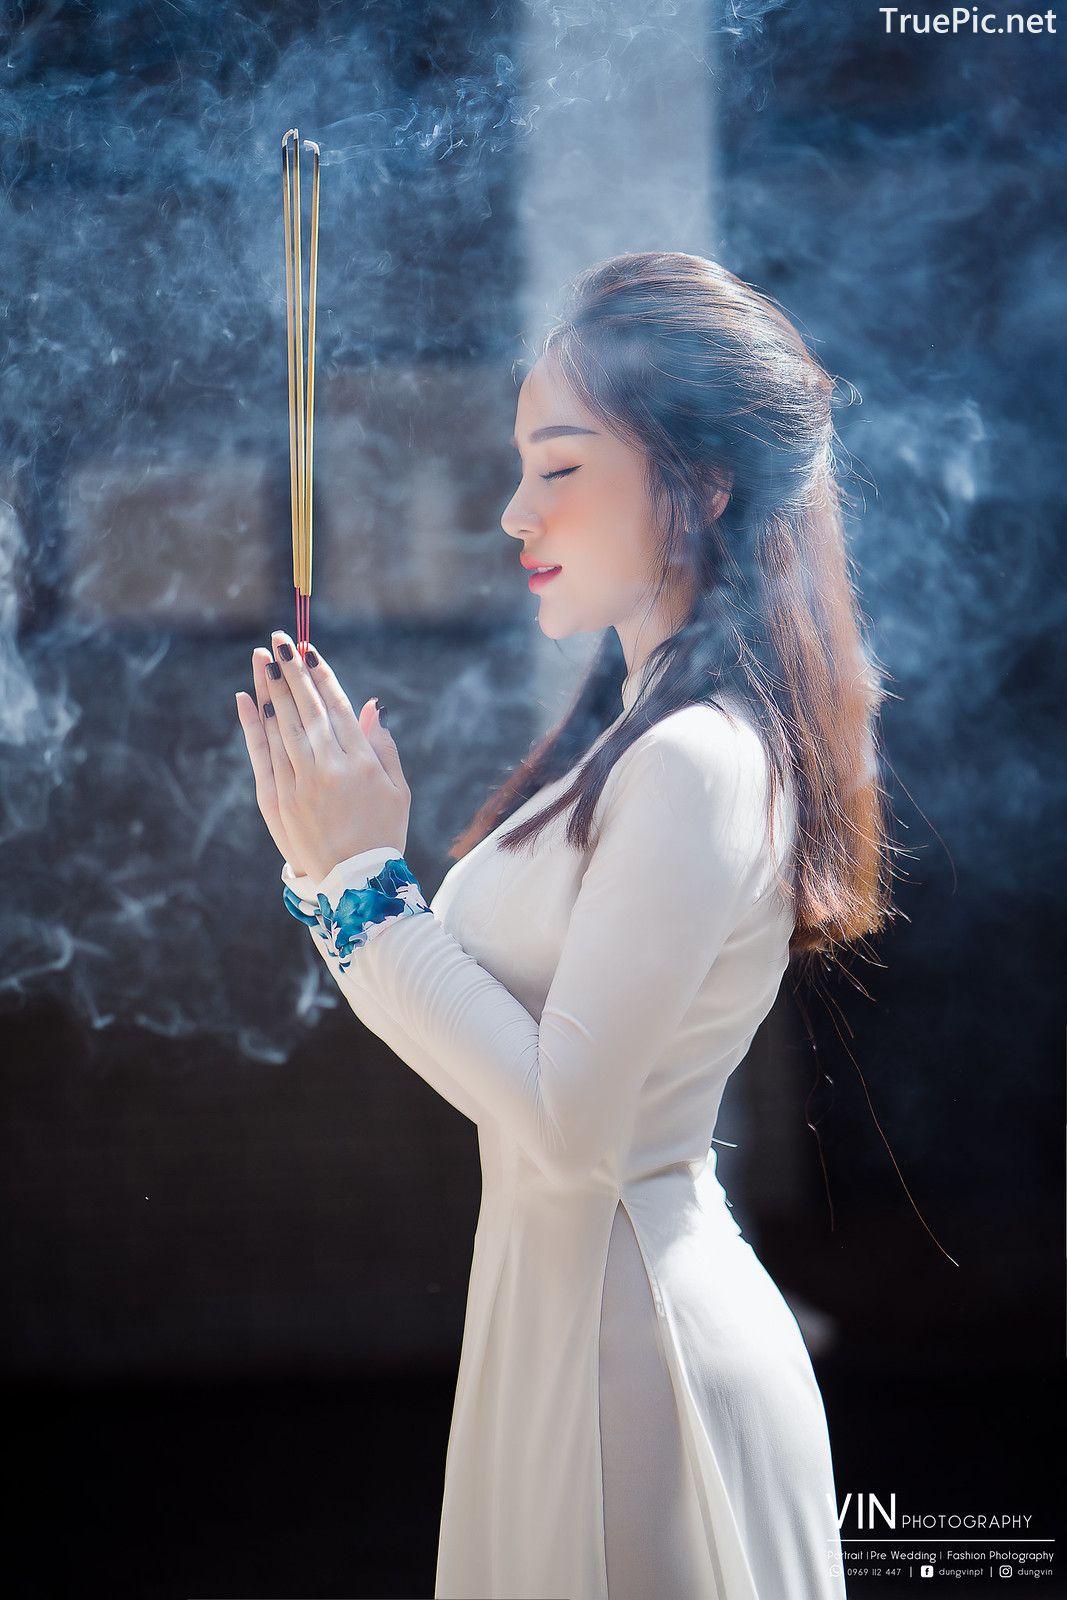 Image-Vietnamese-Beautiful-Girl-Ao-Dai-Vietnam-Traditional-Dress-by-VIN-Photo-1-TruePic.net- Picture-6